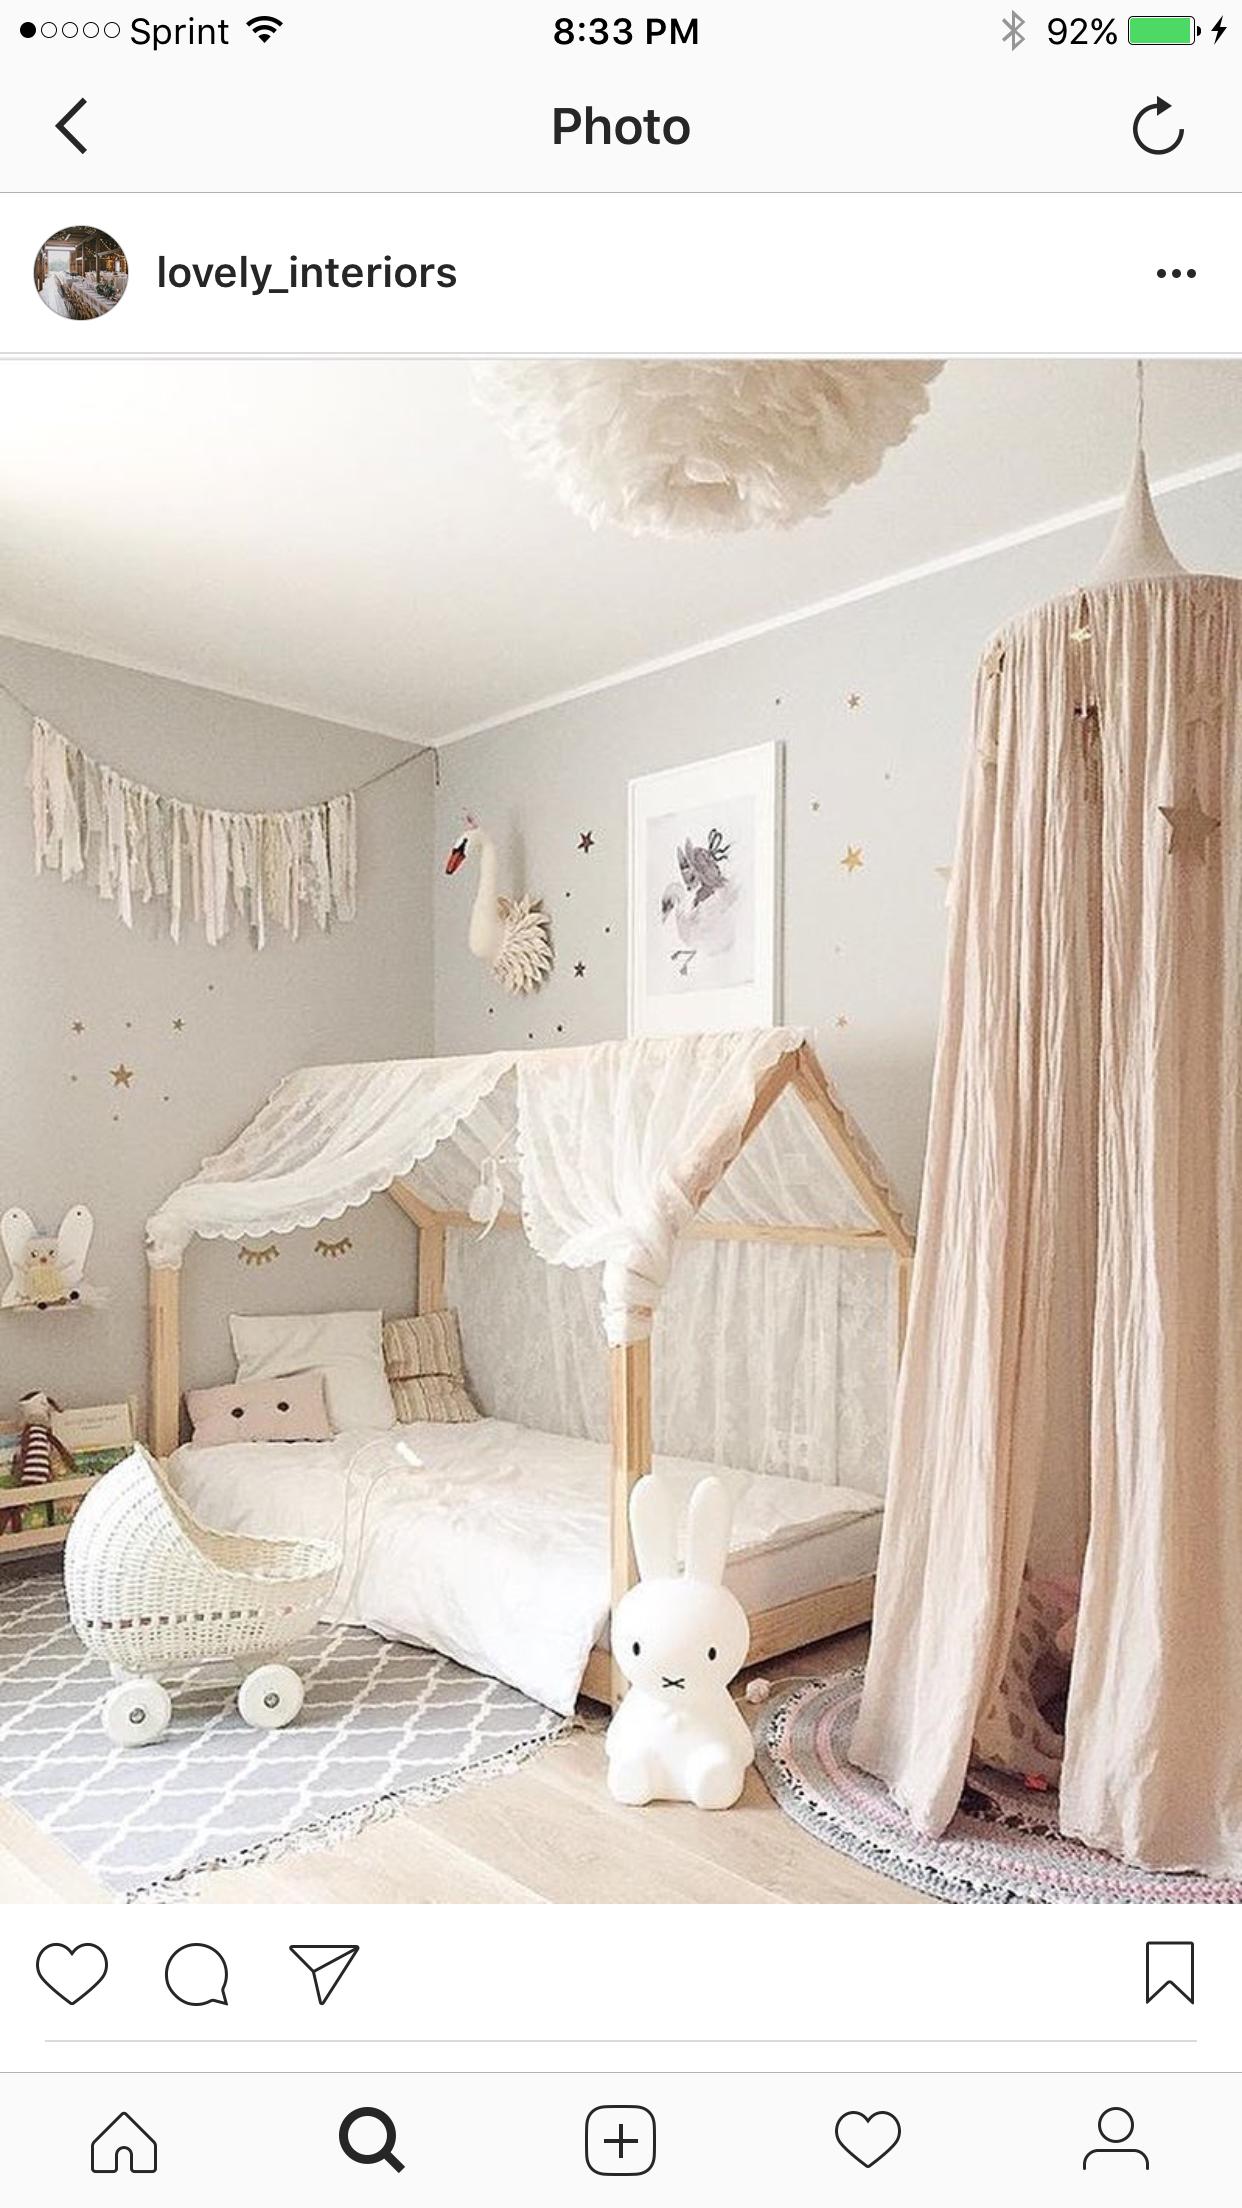 d46204e1dbd Διακόσμηση Βρεφικού Δωματίου, Kura Bed, Κοριτσίστικα Δωμάτια, Όμορφο  Υπνοδωμάτιο, Girls Bedroom,